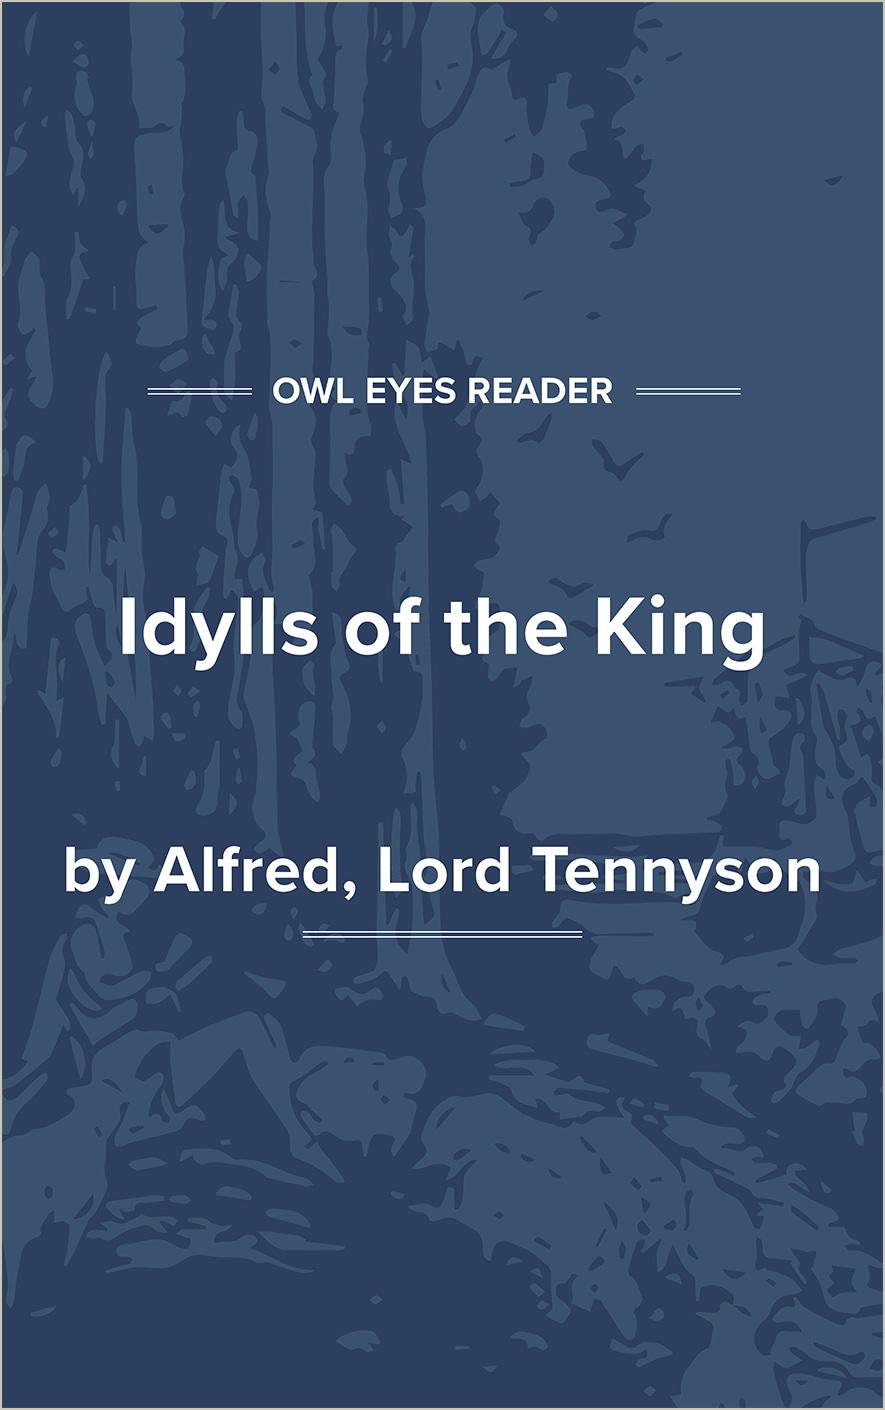 Idylls King Cover Image